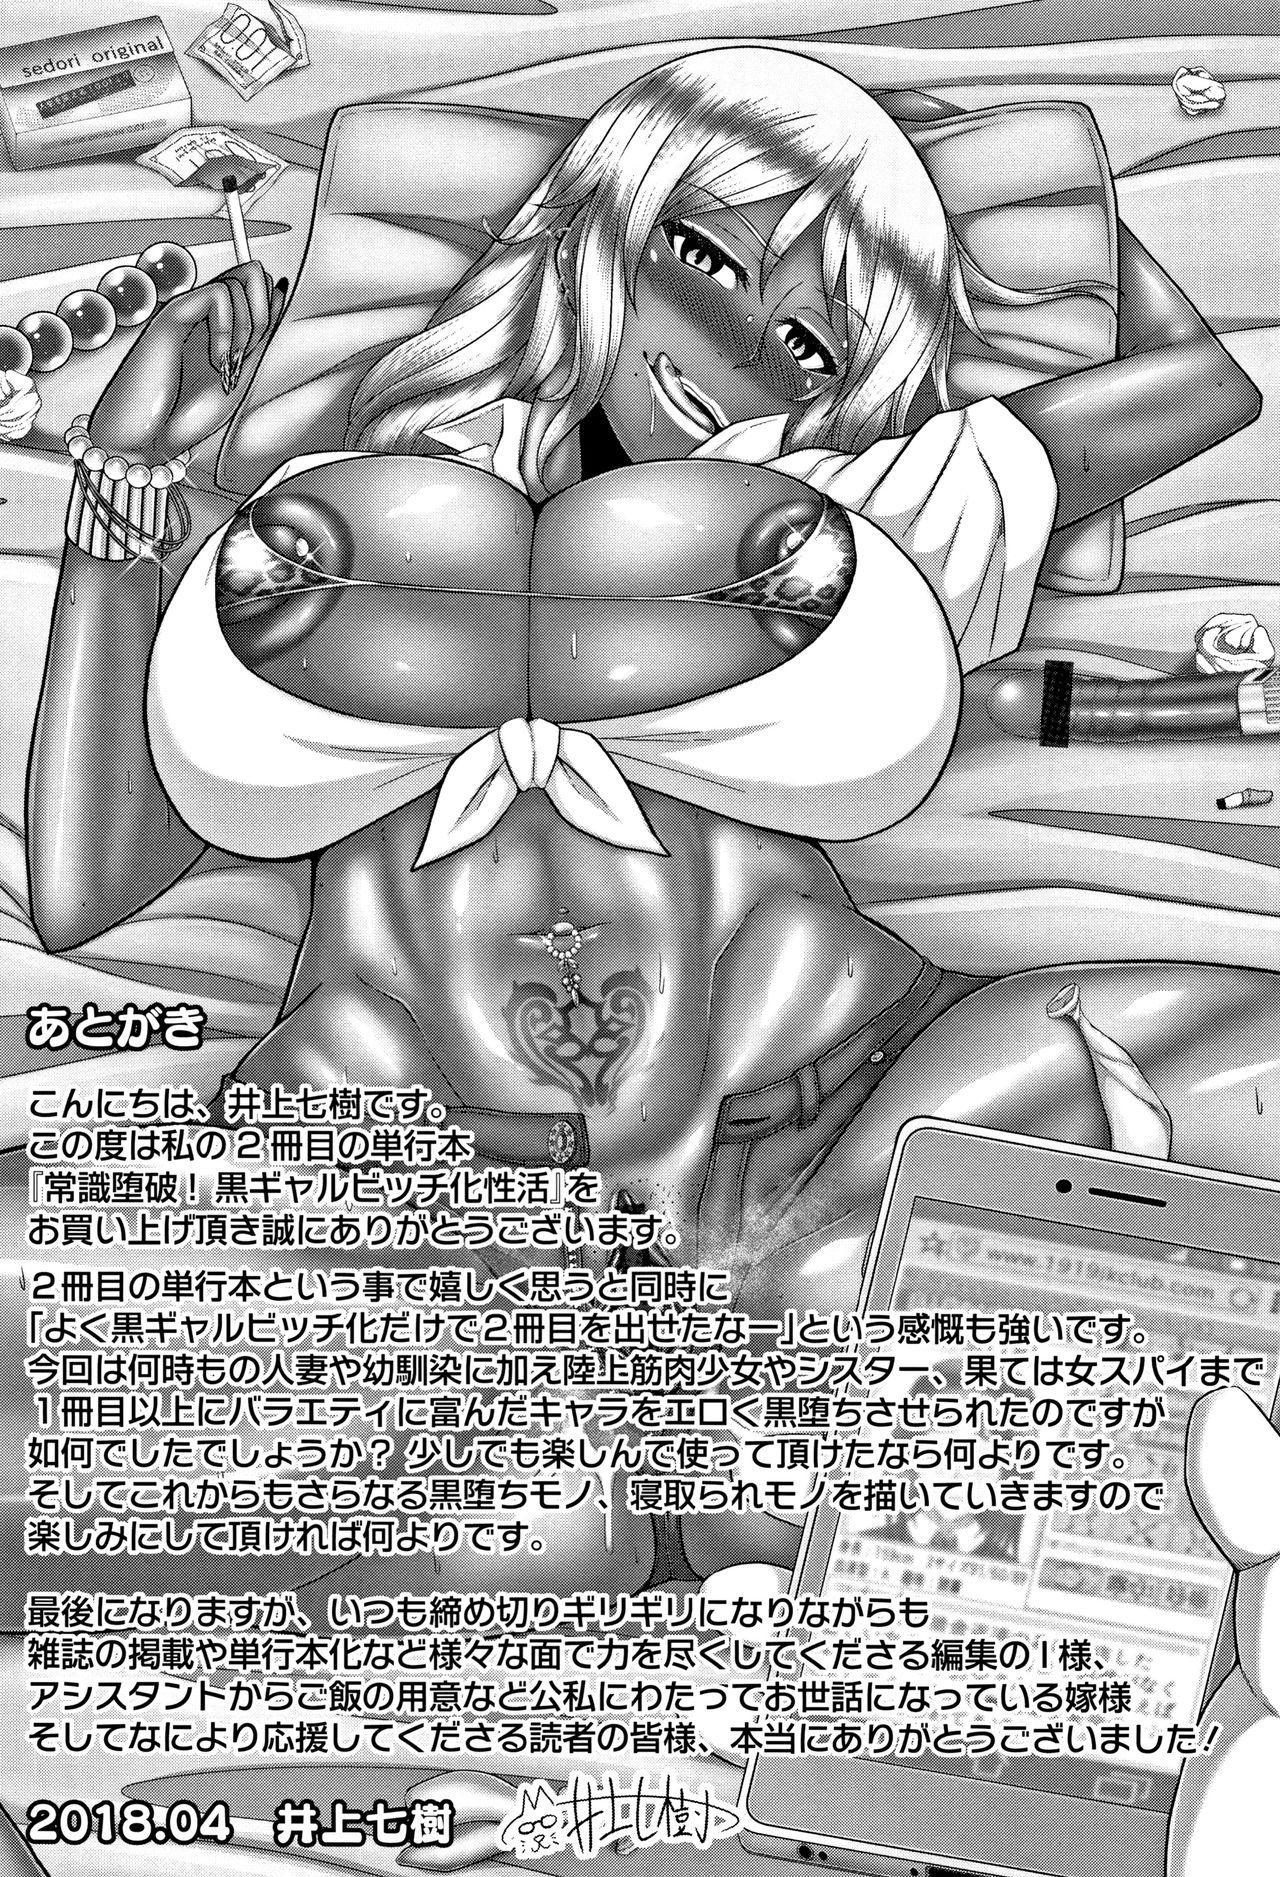 [Inoue Nanaki] Joushiki Daha! Kuro Gal Bitch-ka Seikatsu Ch. 1-3, 5-8 [English] [Dark Mac + N04h] 147